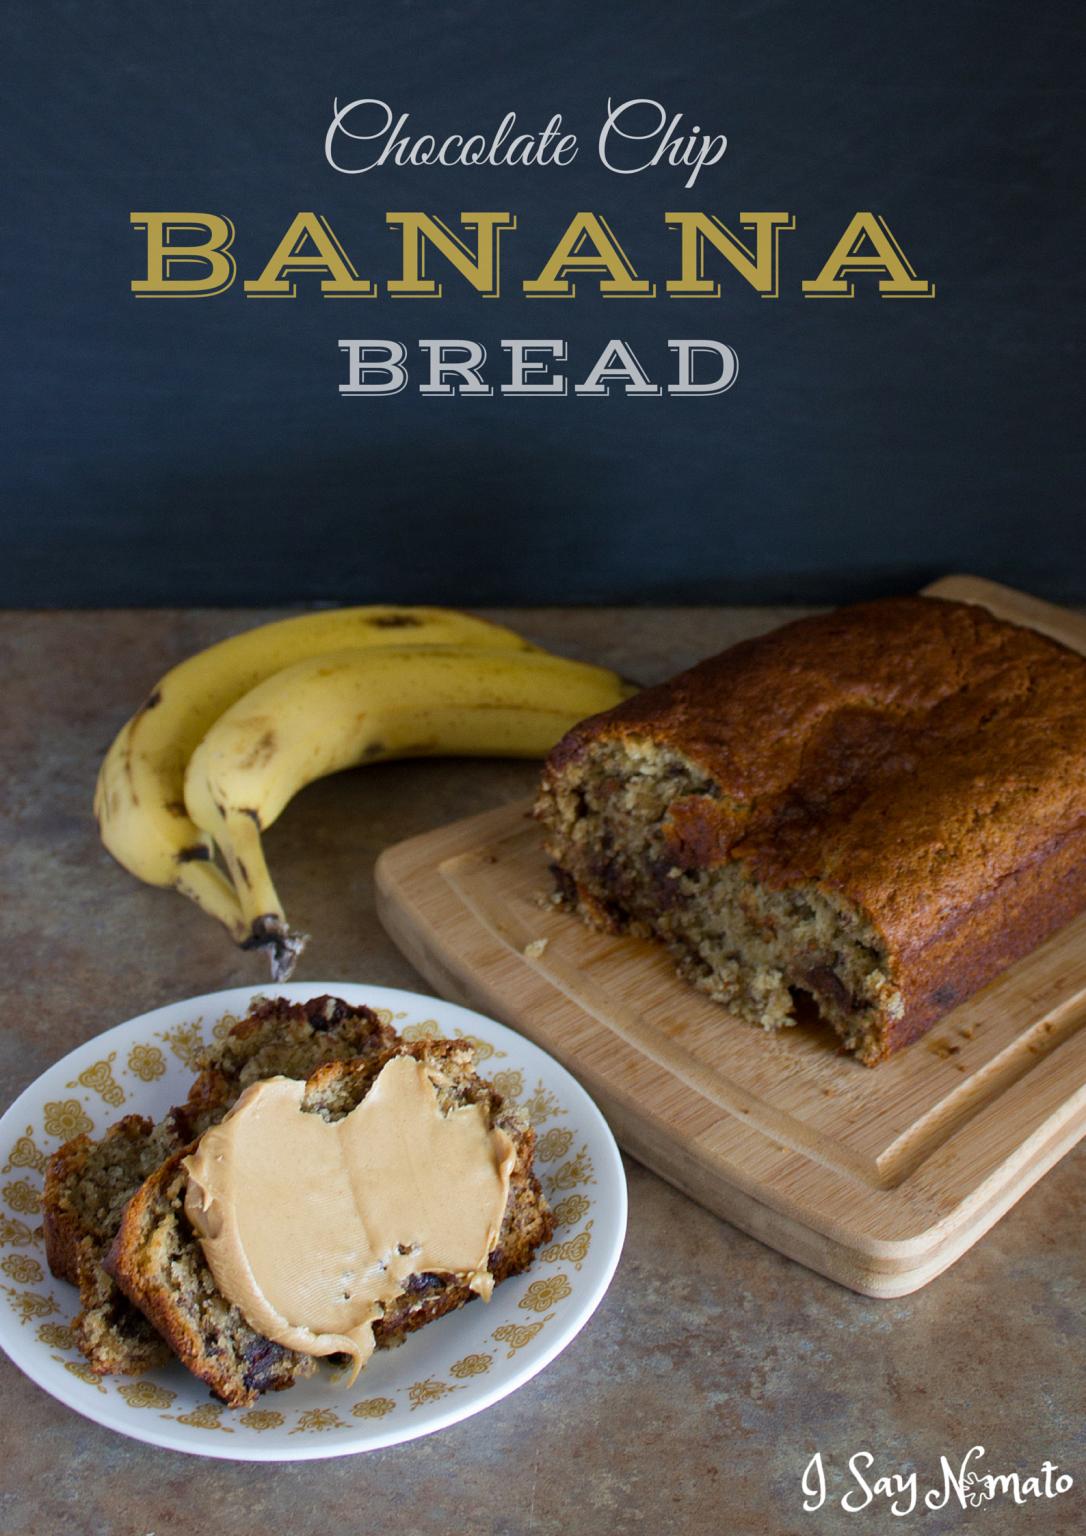 Chocolate Chip Banana Bread - I Say Nomato Nightshade Free Food Blog